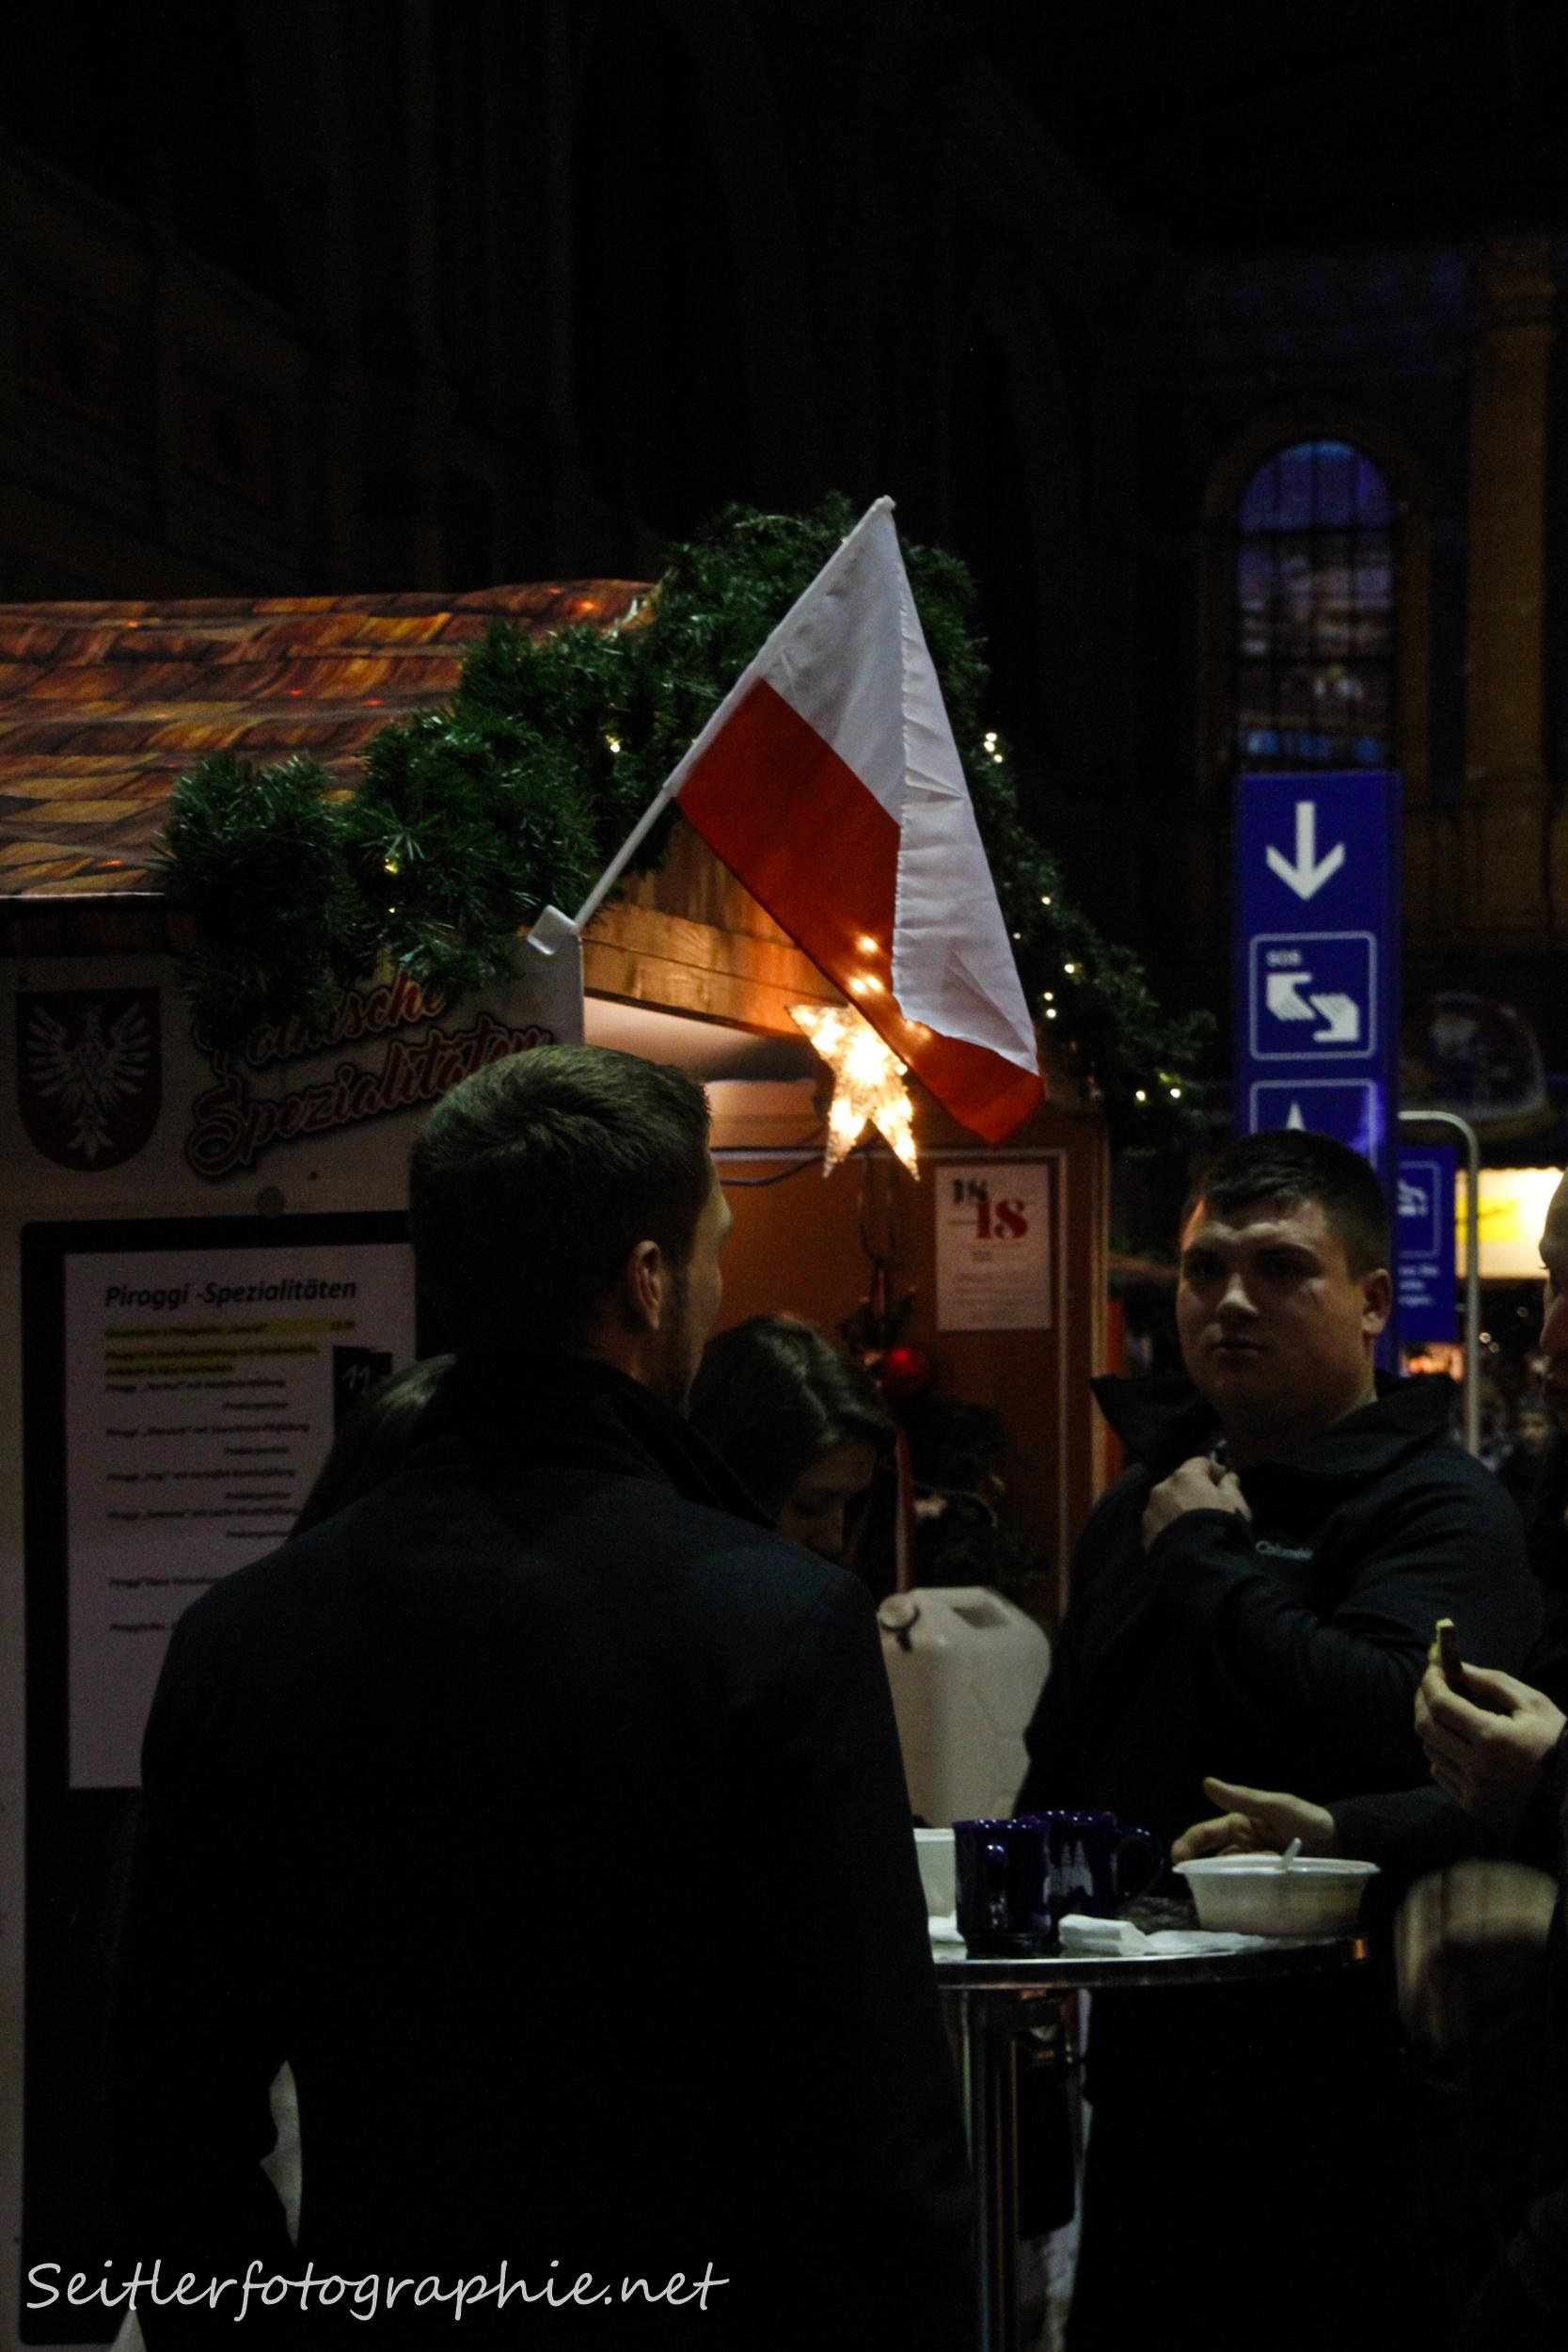 20161127_weihnachtsmarkt_joannarutkoseitler_43